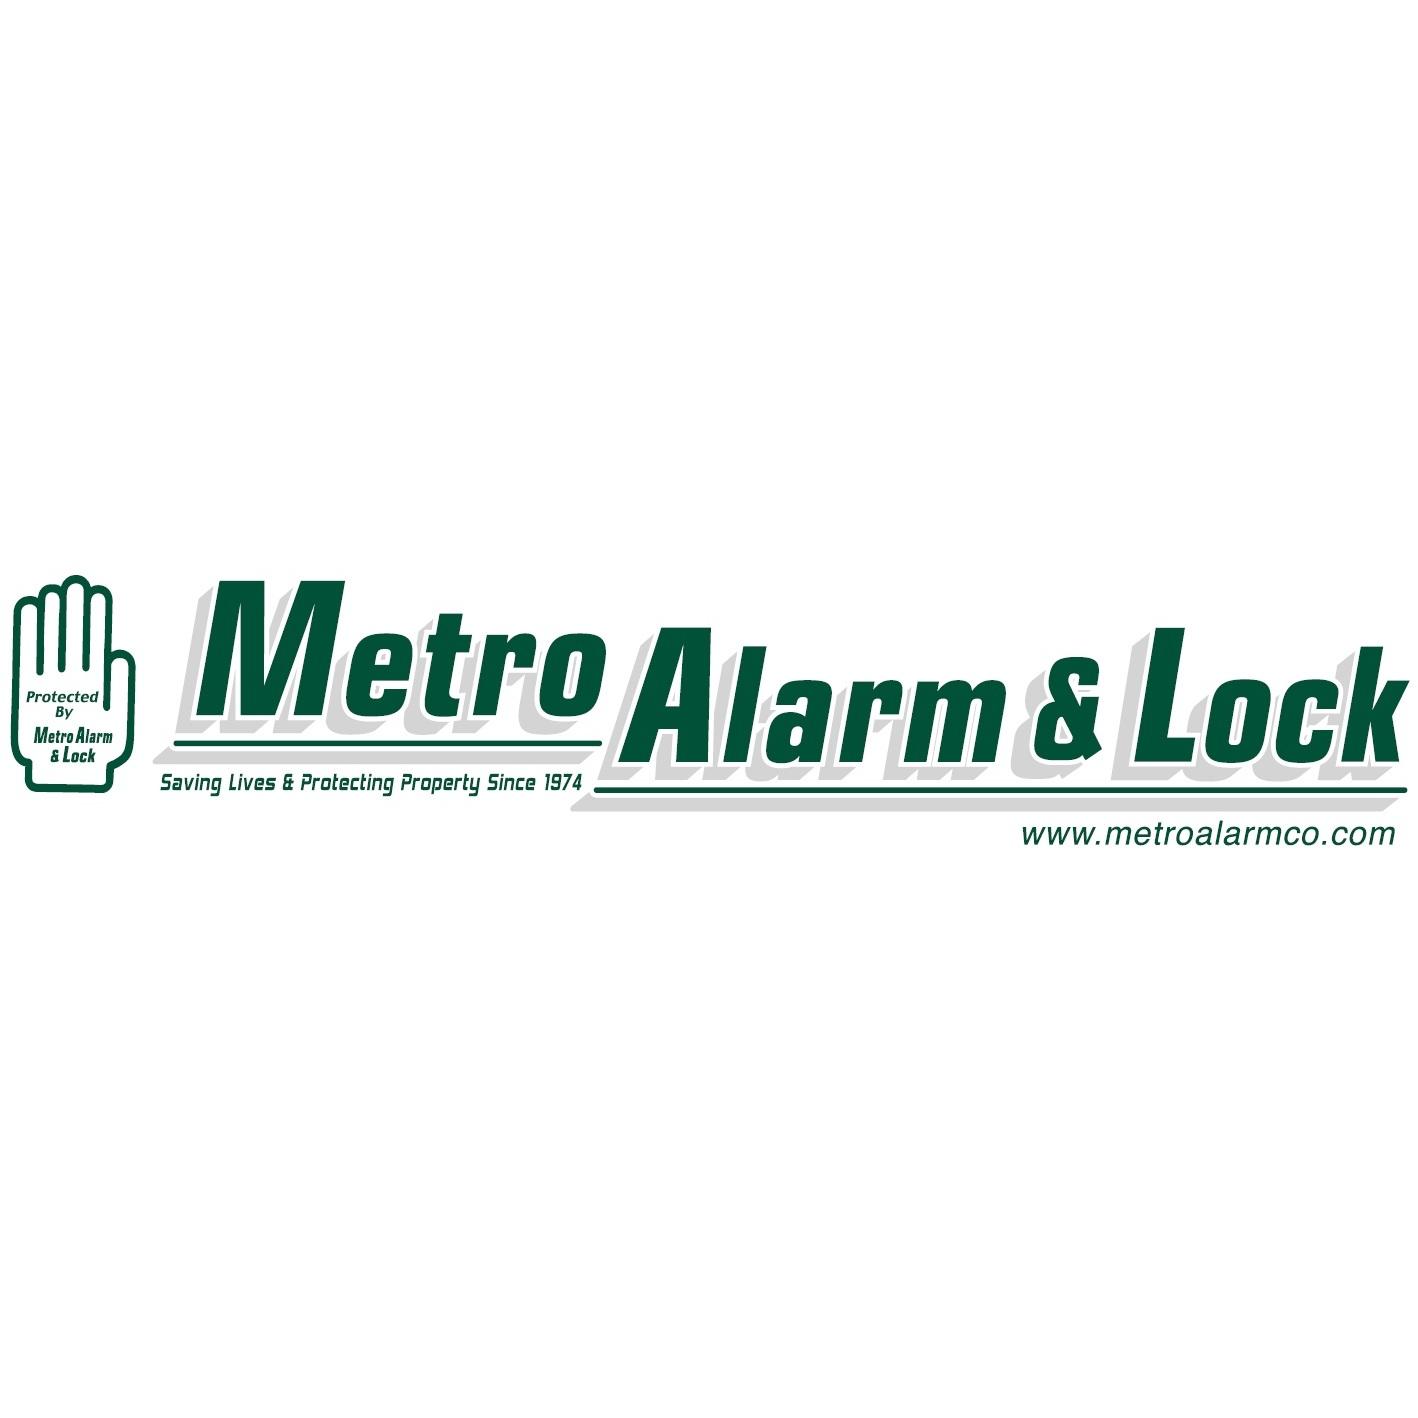 Metro Alarm & Lock